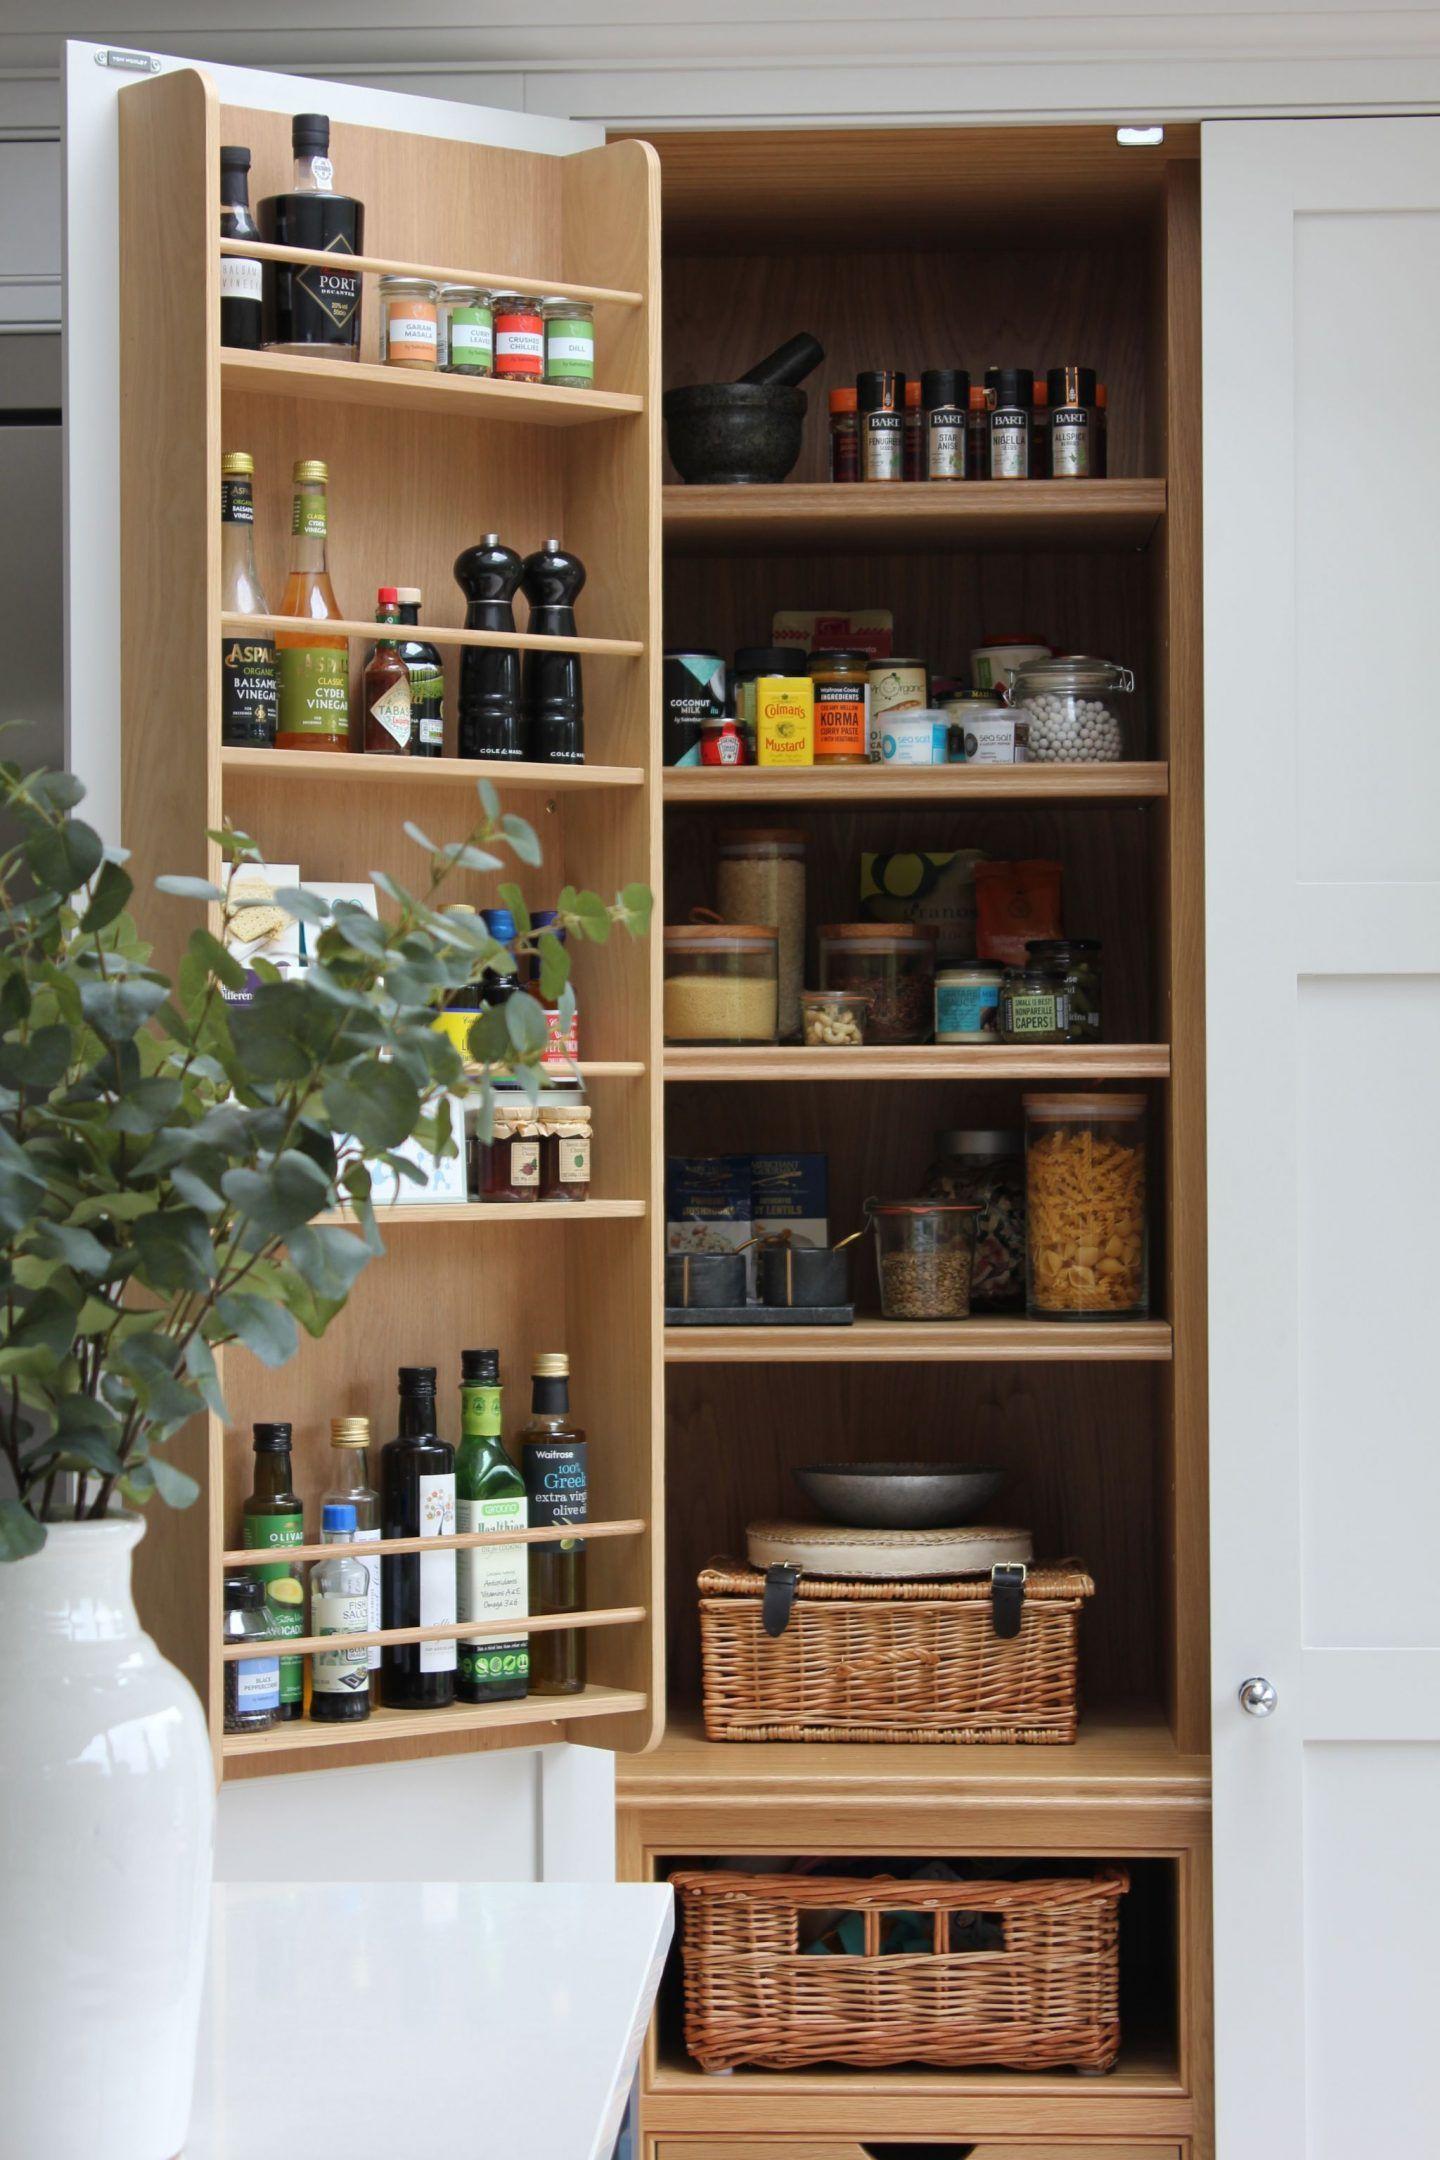 My Kitchen Exposed - Just a Little Build #designmykitchen ...